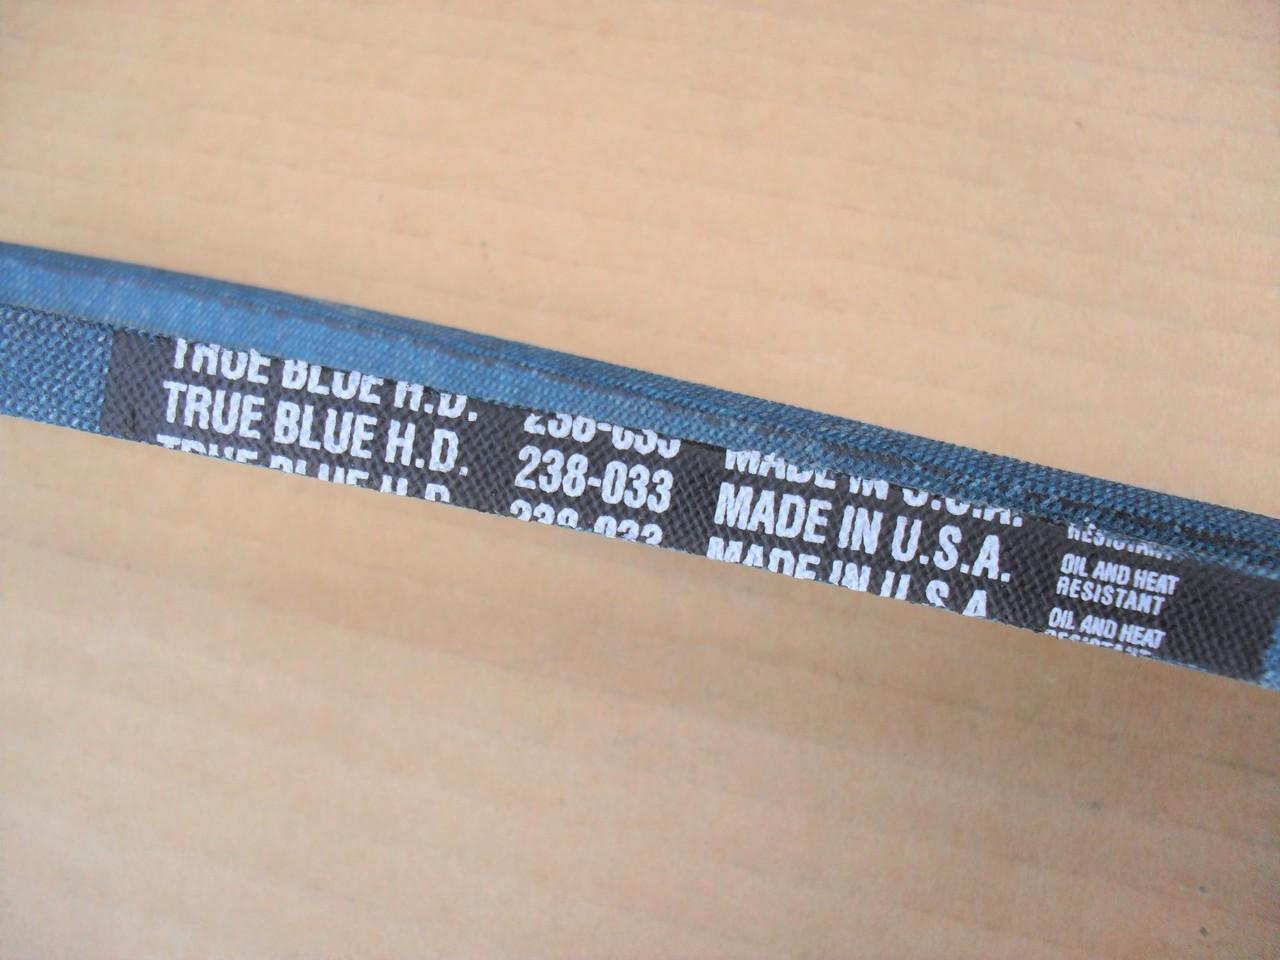 MASSEY FERGUSON 1676461 made with Kevlar Replacement Belt